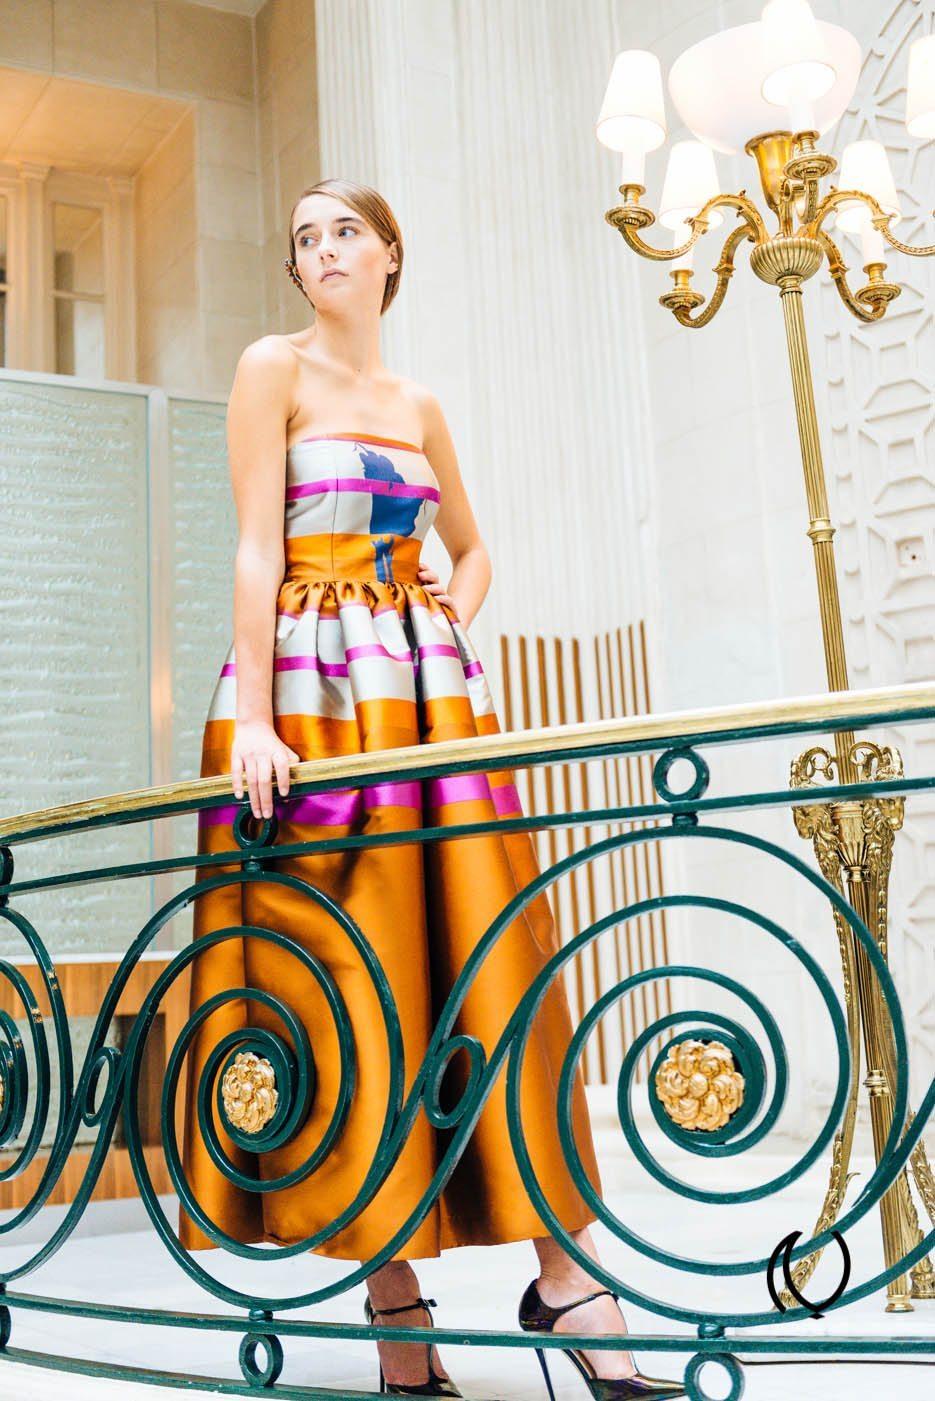 EyesForLondon-Luxury-Naina.co-Raconteuse-Visuelle-Visual-StoryTeller-Photographer-London-Fashion-Week-Kilian-Kerner-Sept-2013